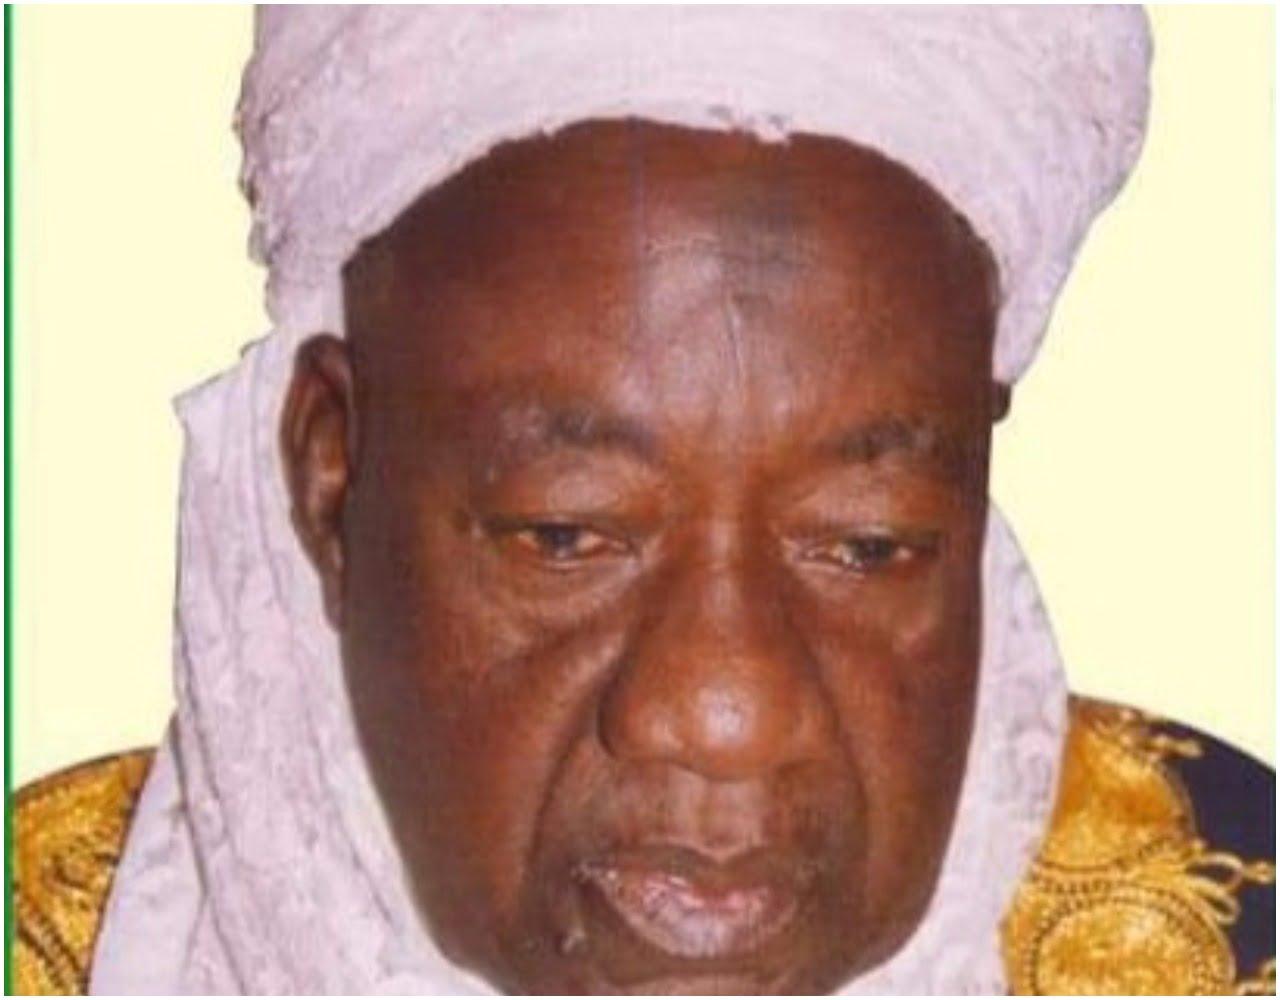 Niger Govt Announces Death Of Emir Of Kagara, Salihu Tanko